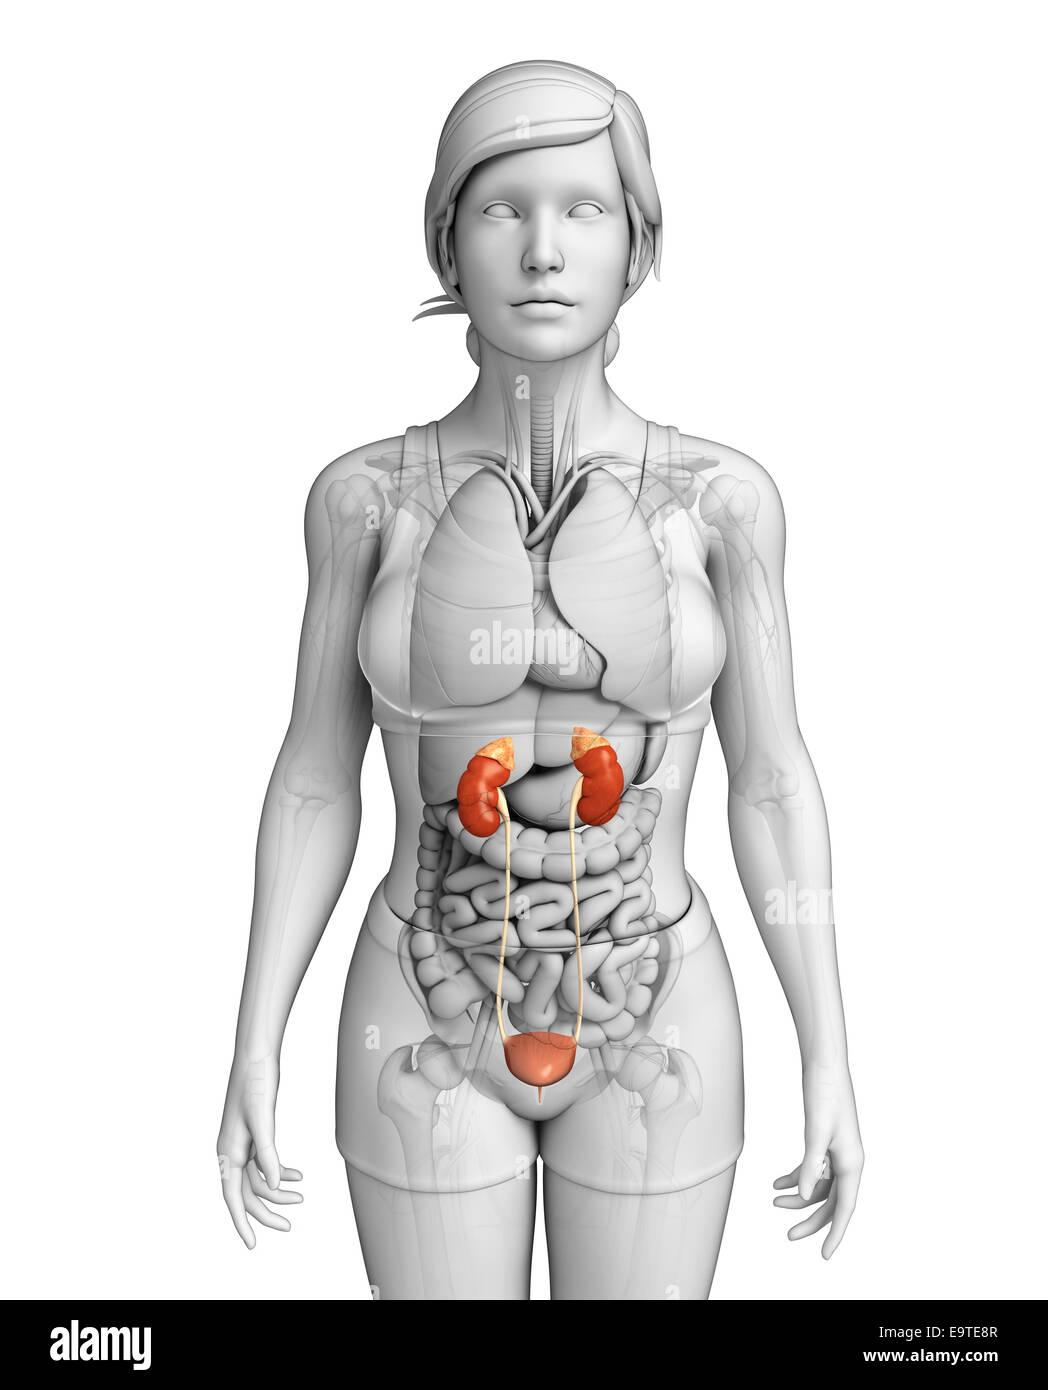 Großzügig Weibliche Harn Anatomie Ideen - Anatomie Ideen - finotti.info